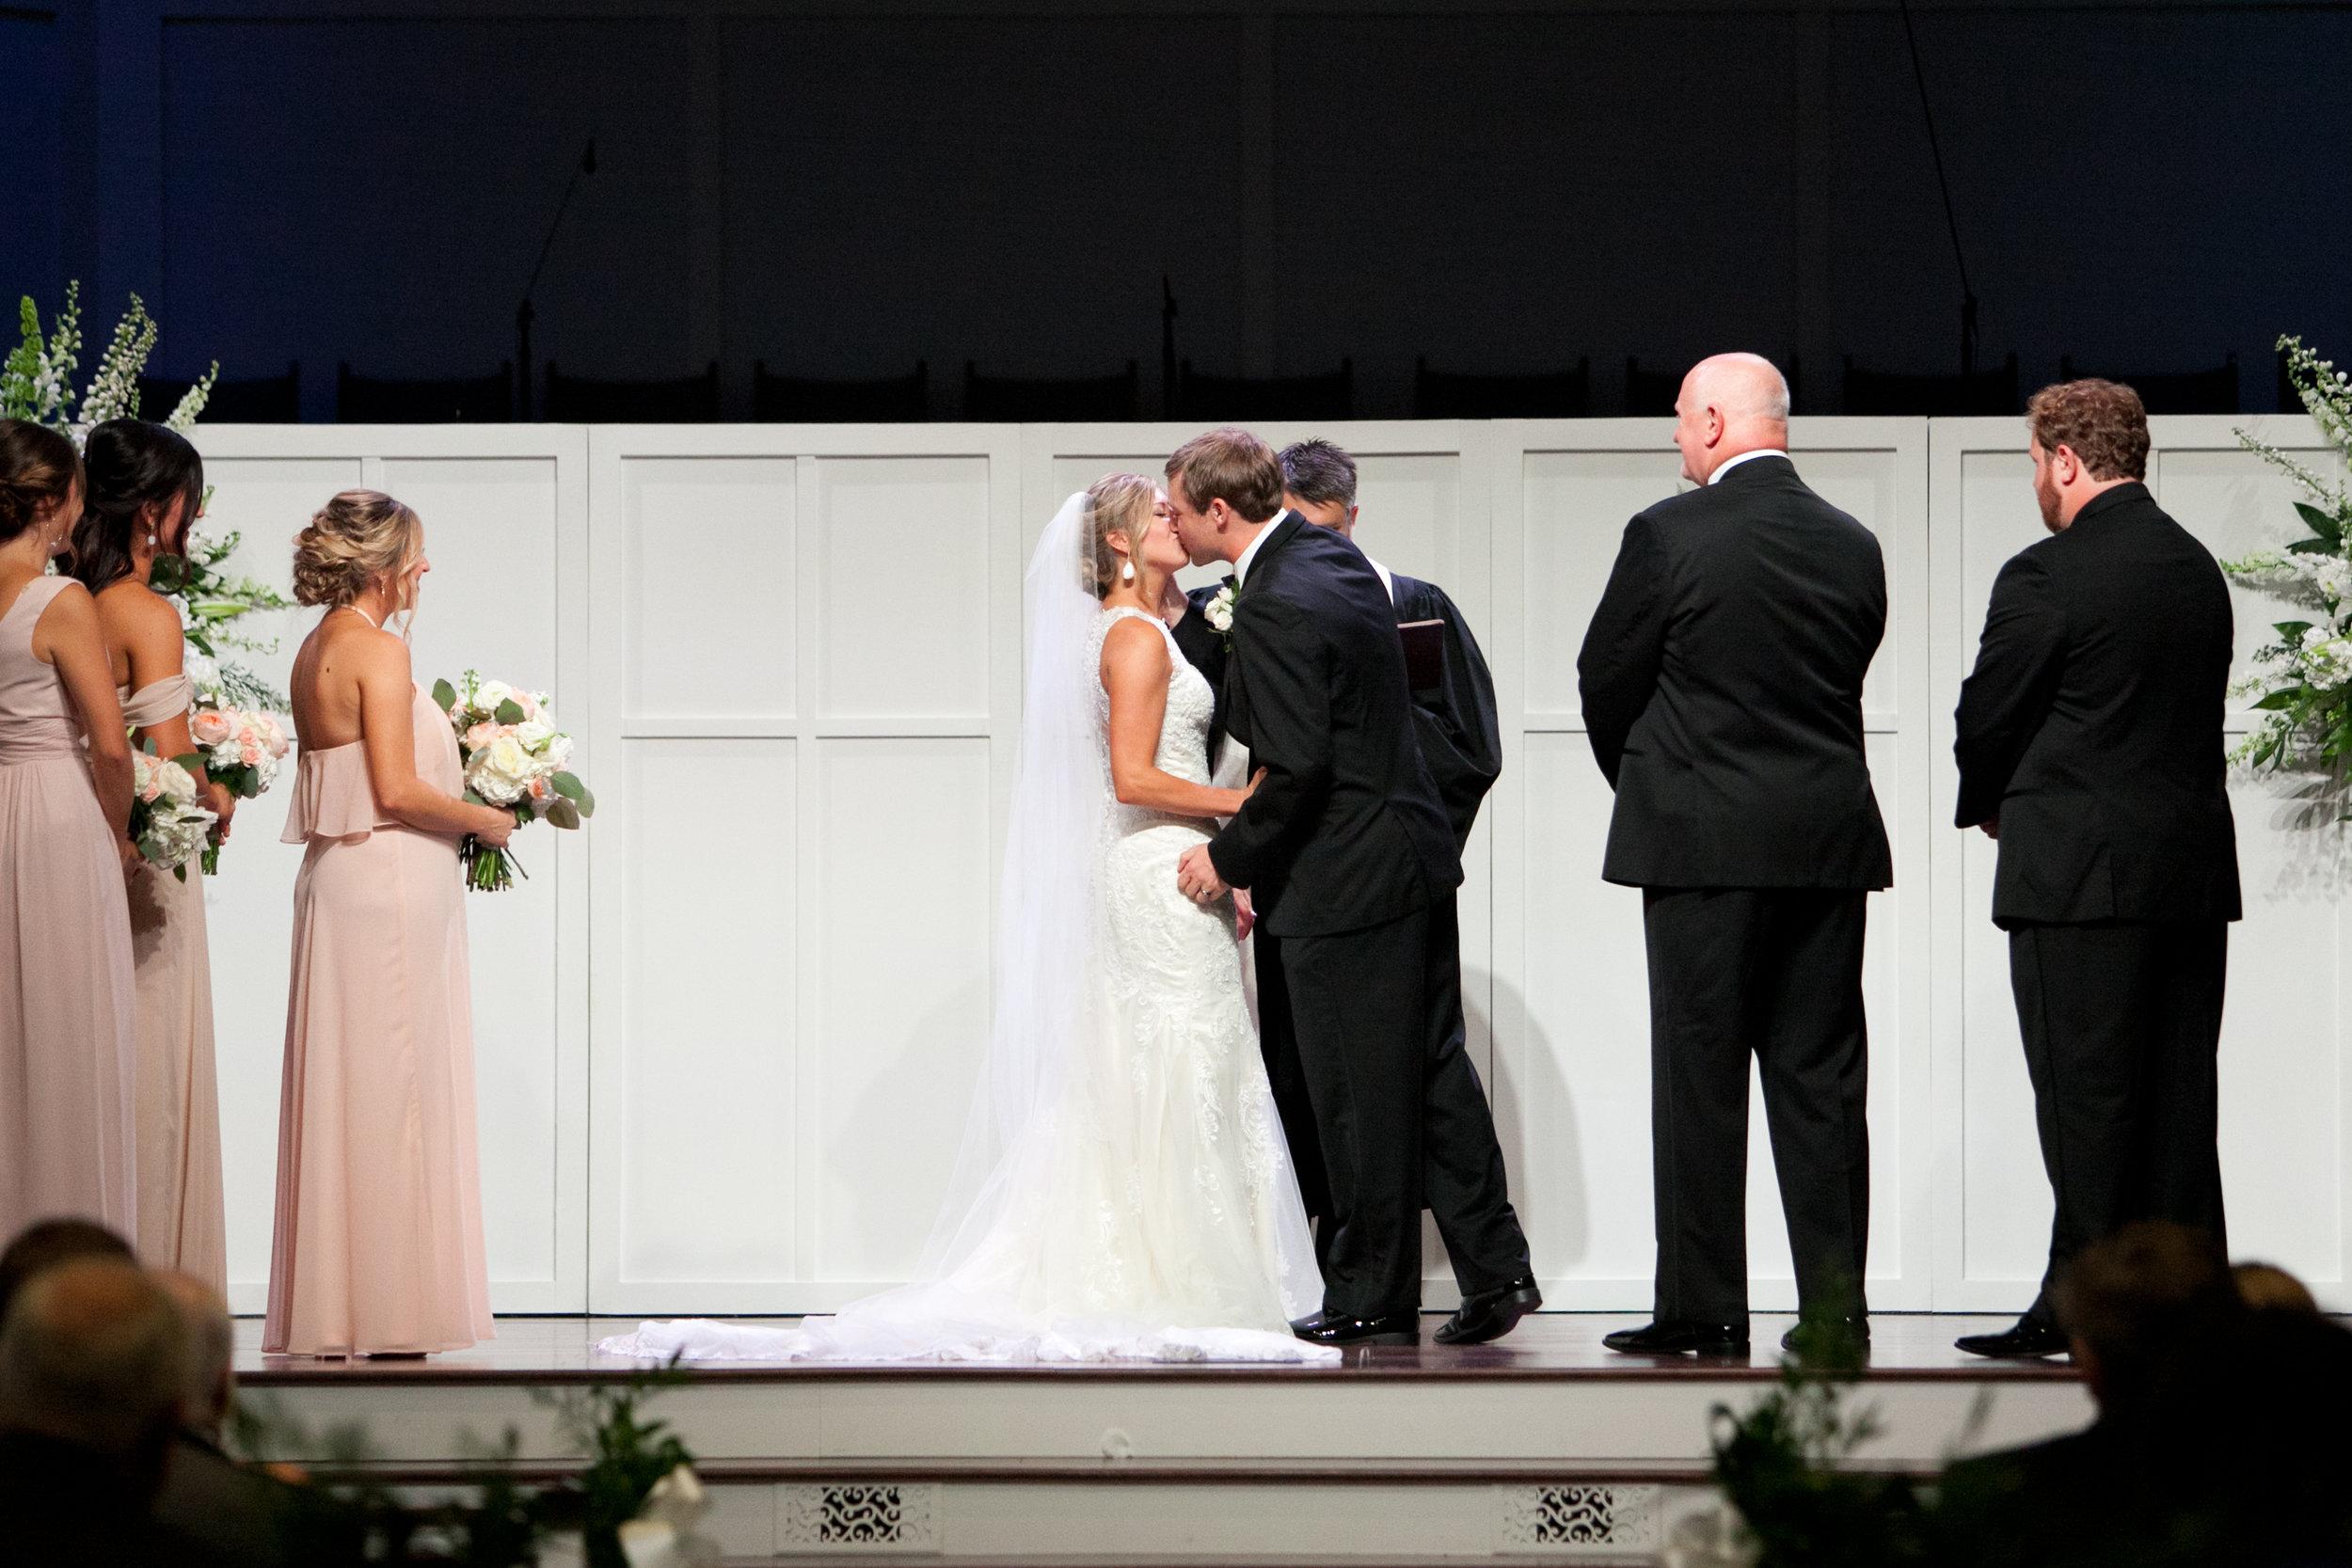 701_whaley_wedding_32.jpg